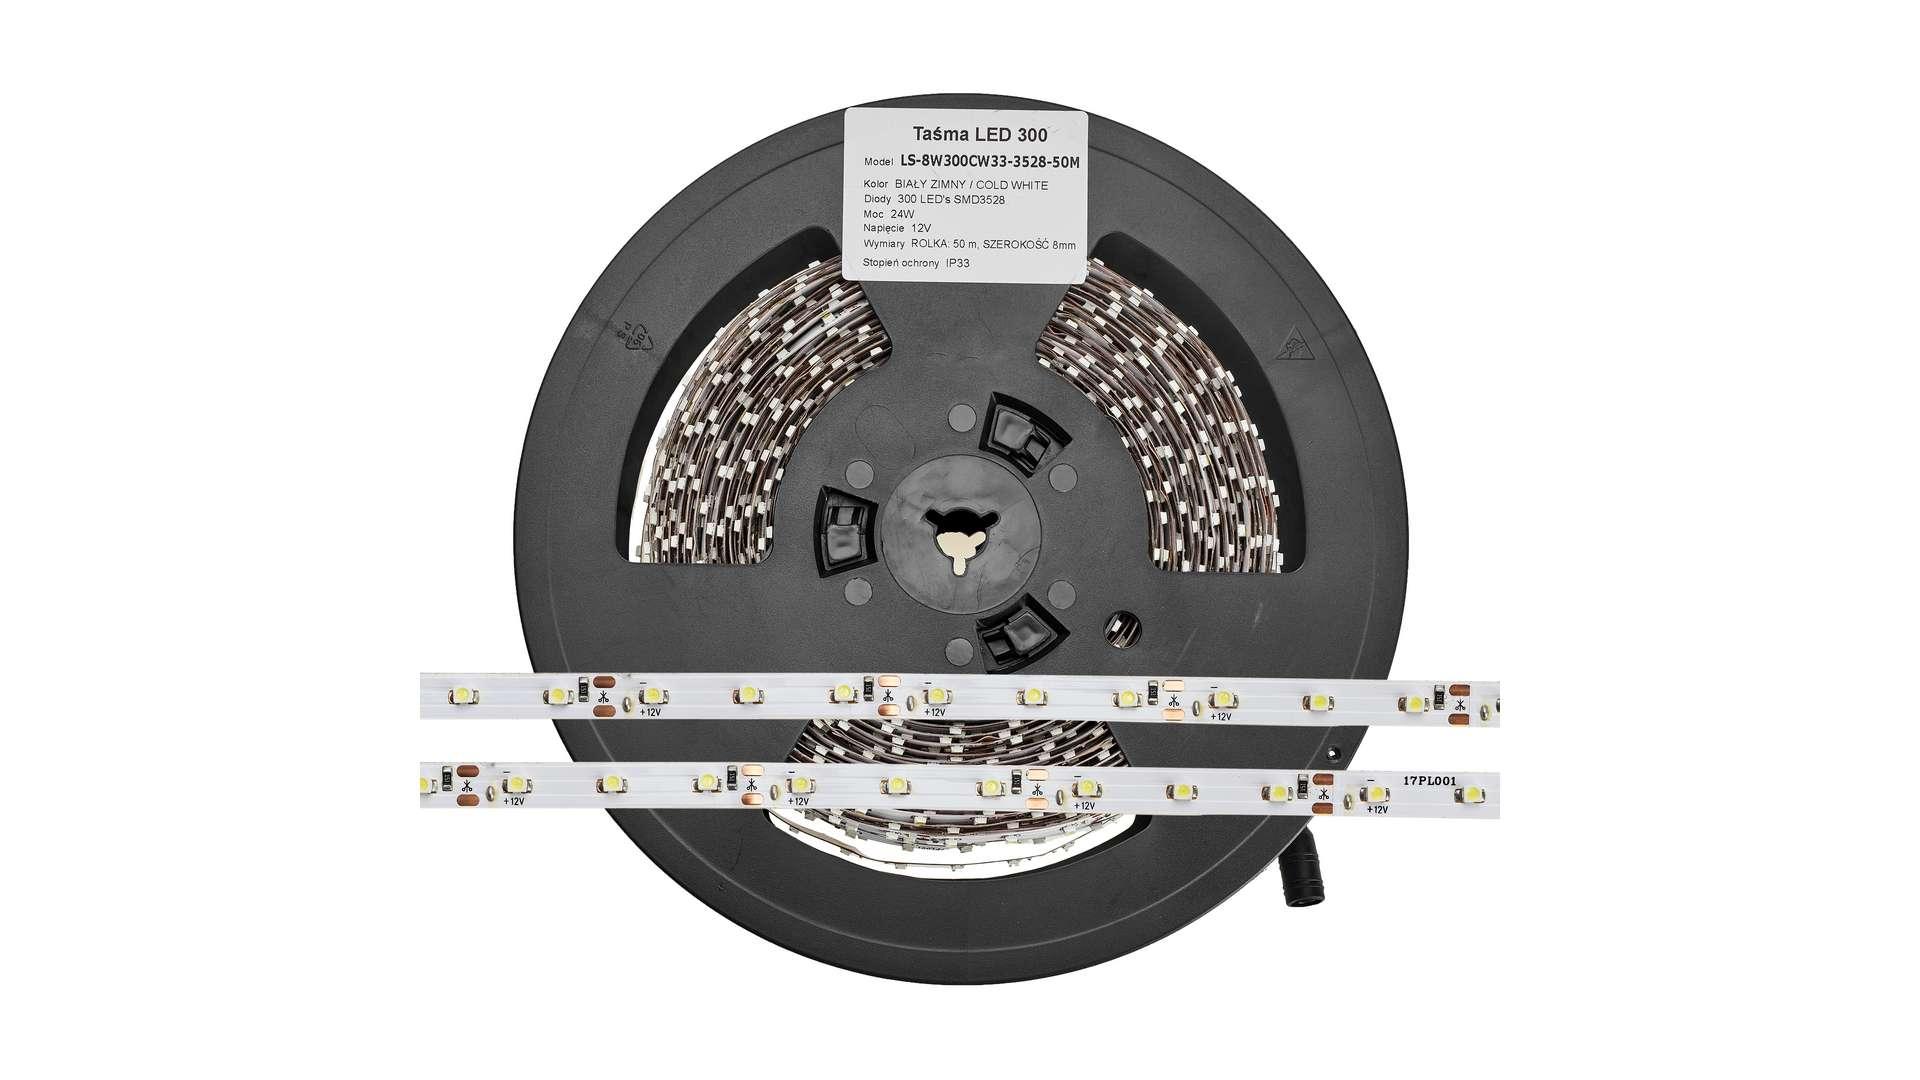 Taśma 300 LED 60 LED/m 2835 SMD WW IP65 - 25m